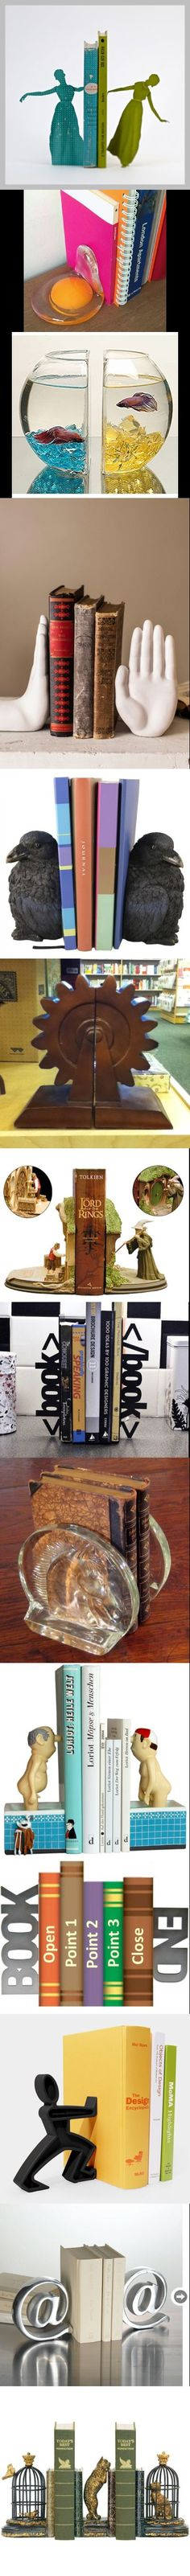 Sujeta libros   -   Bookend (more at:) http://pinterest.com/okknihovna/bookend-zarazky-na-knihy/